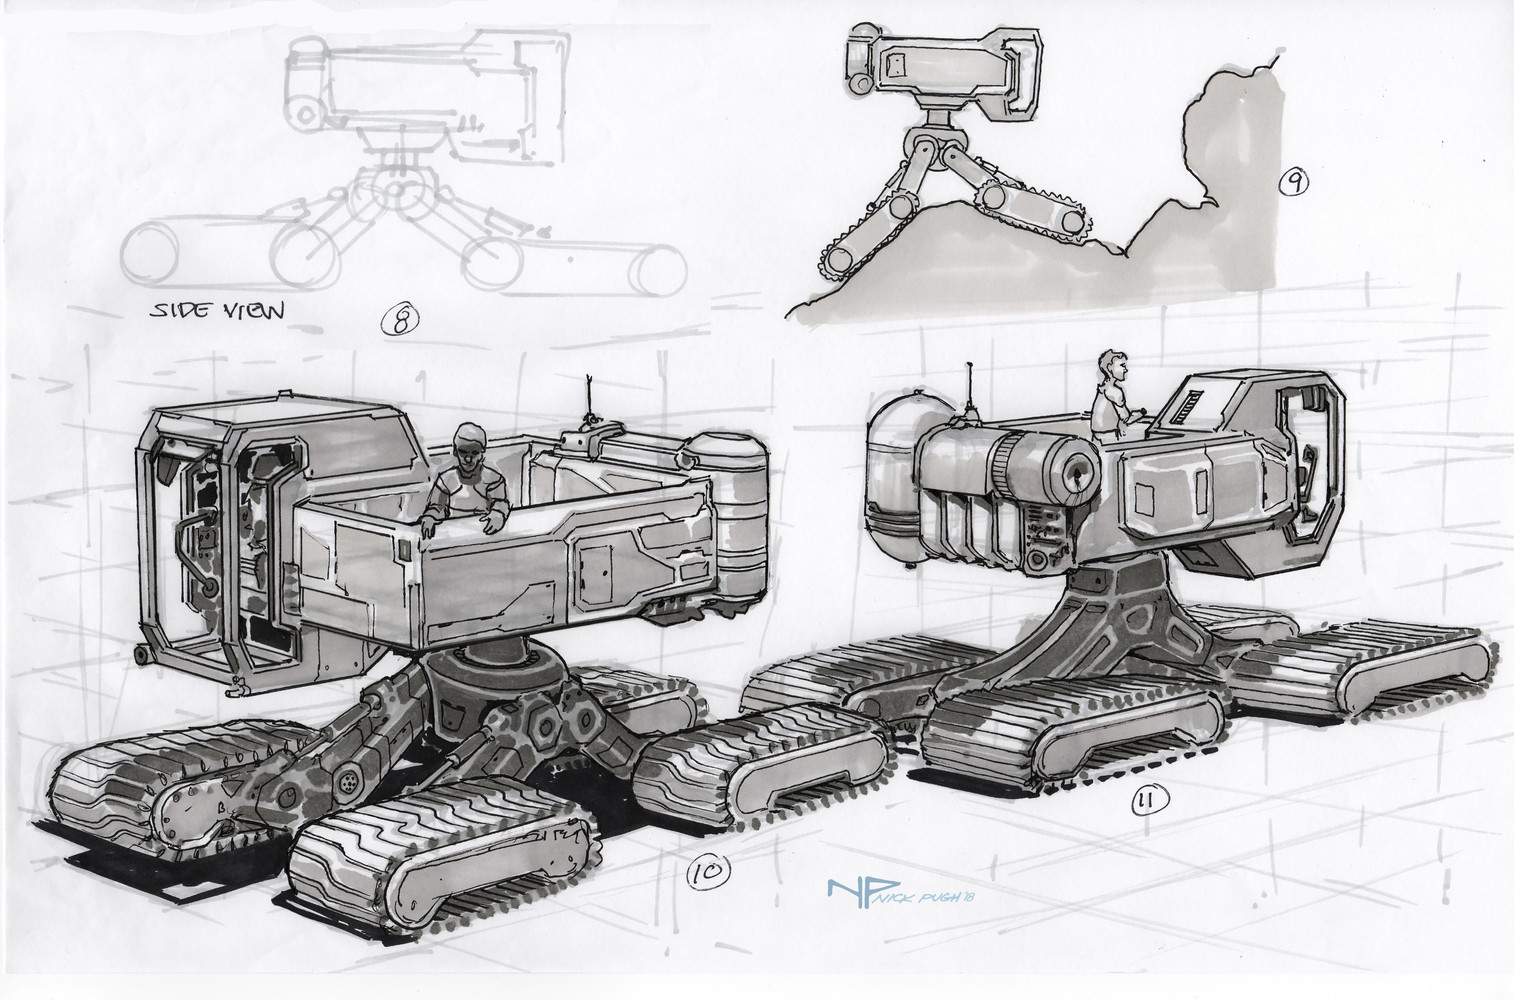 TRX_180214_0000_Set_RockCrawler2_Sketch_